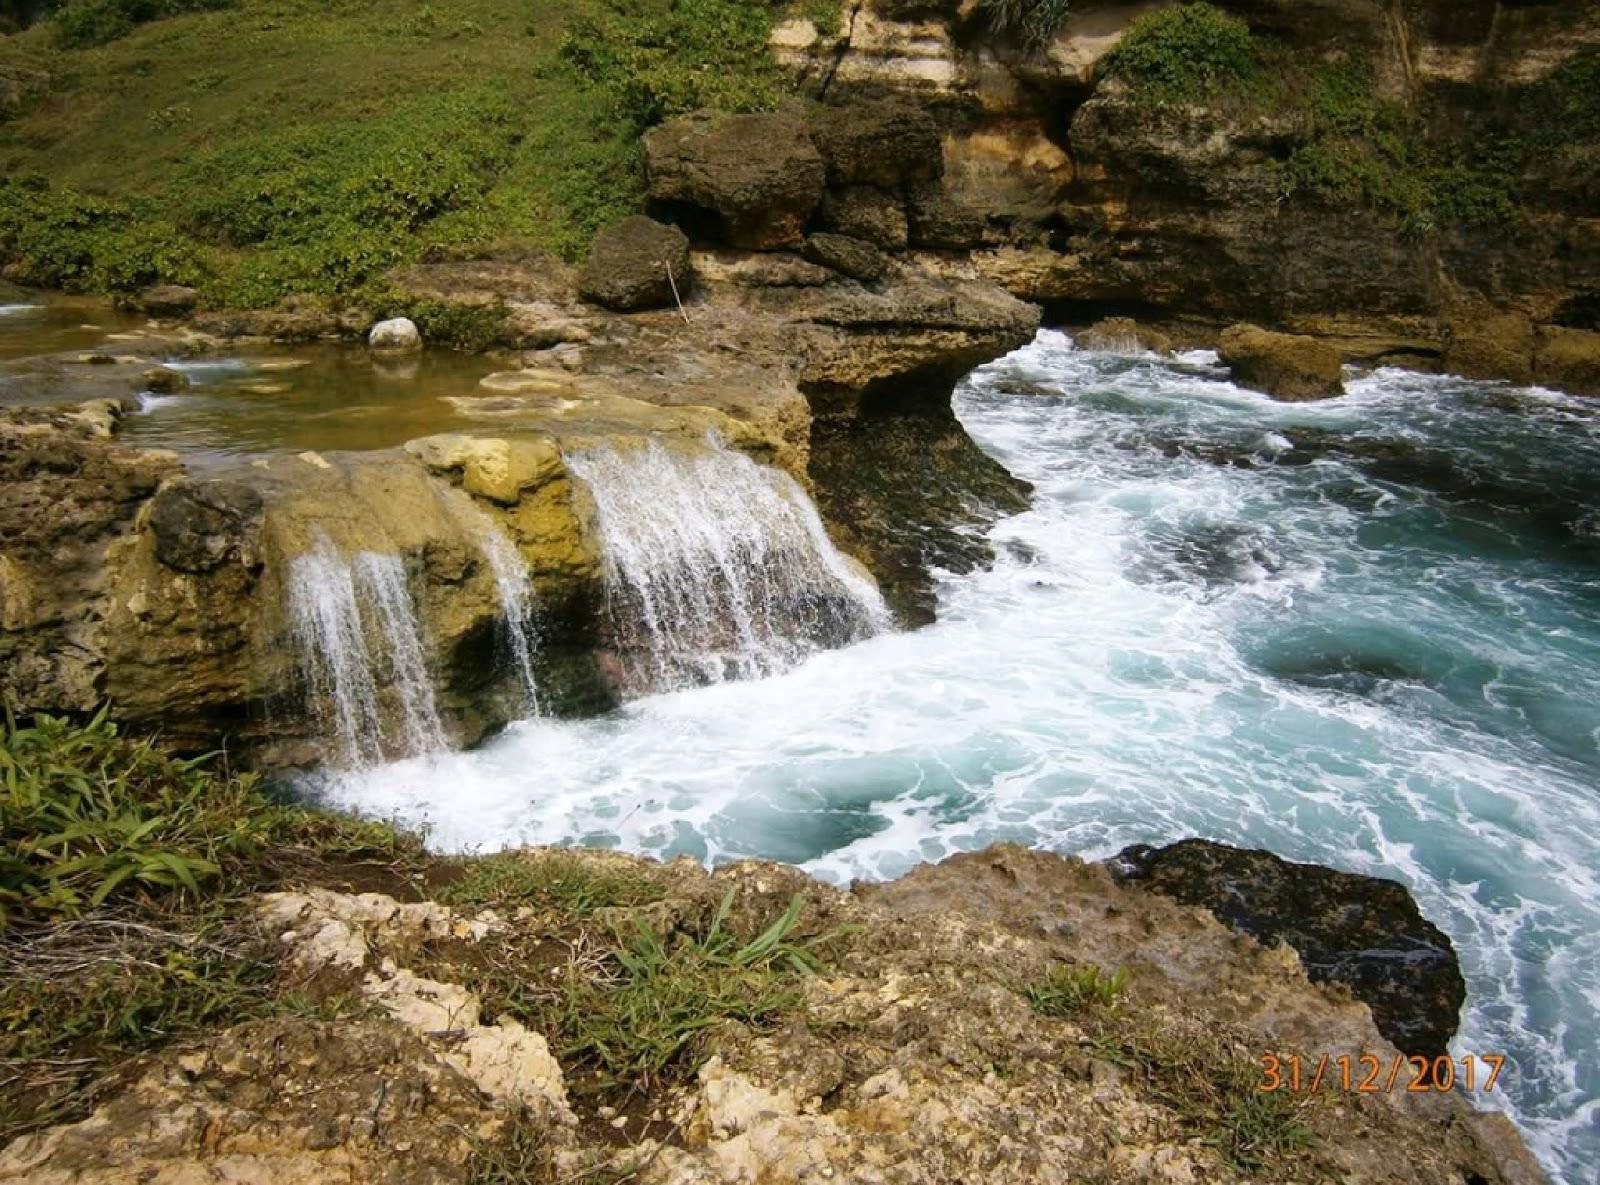 10 Gambar Pantai Ngandul Pacitan Jawa Timur, Rute + Lokasi dan Penginapan